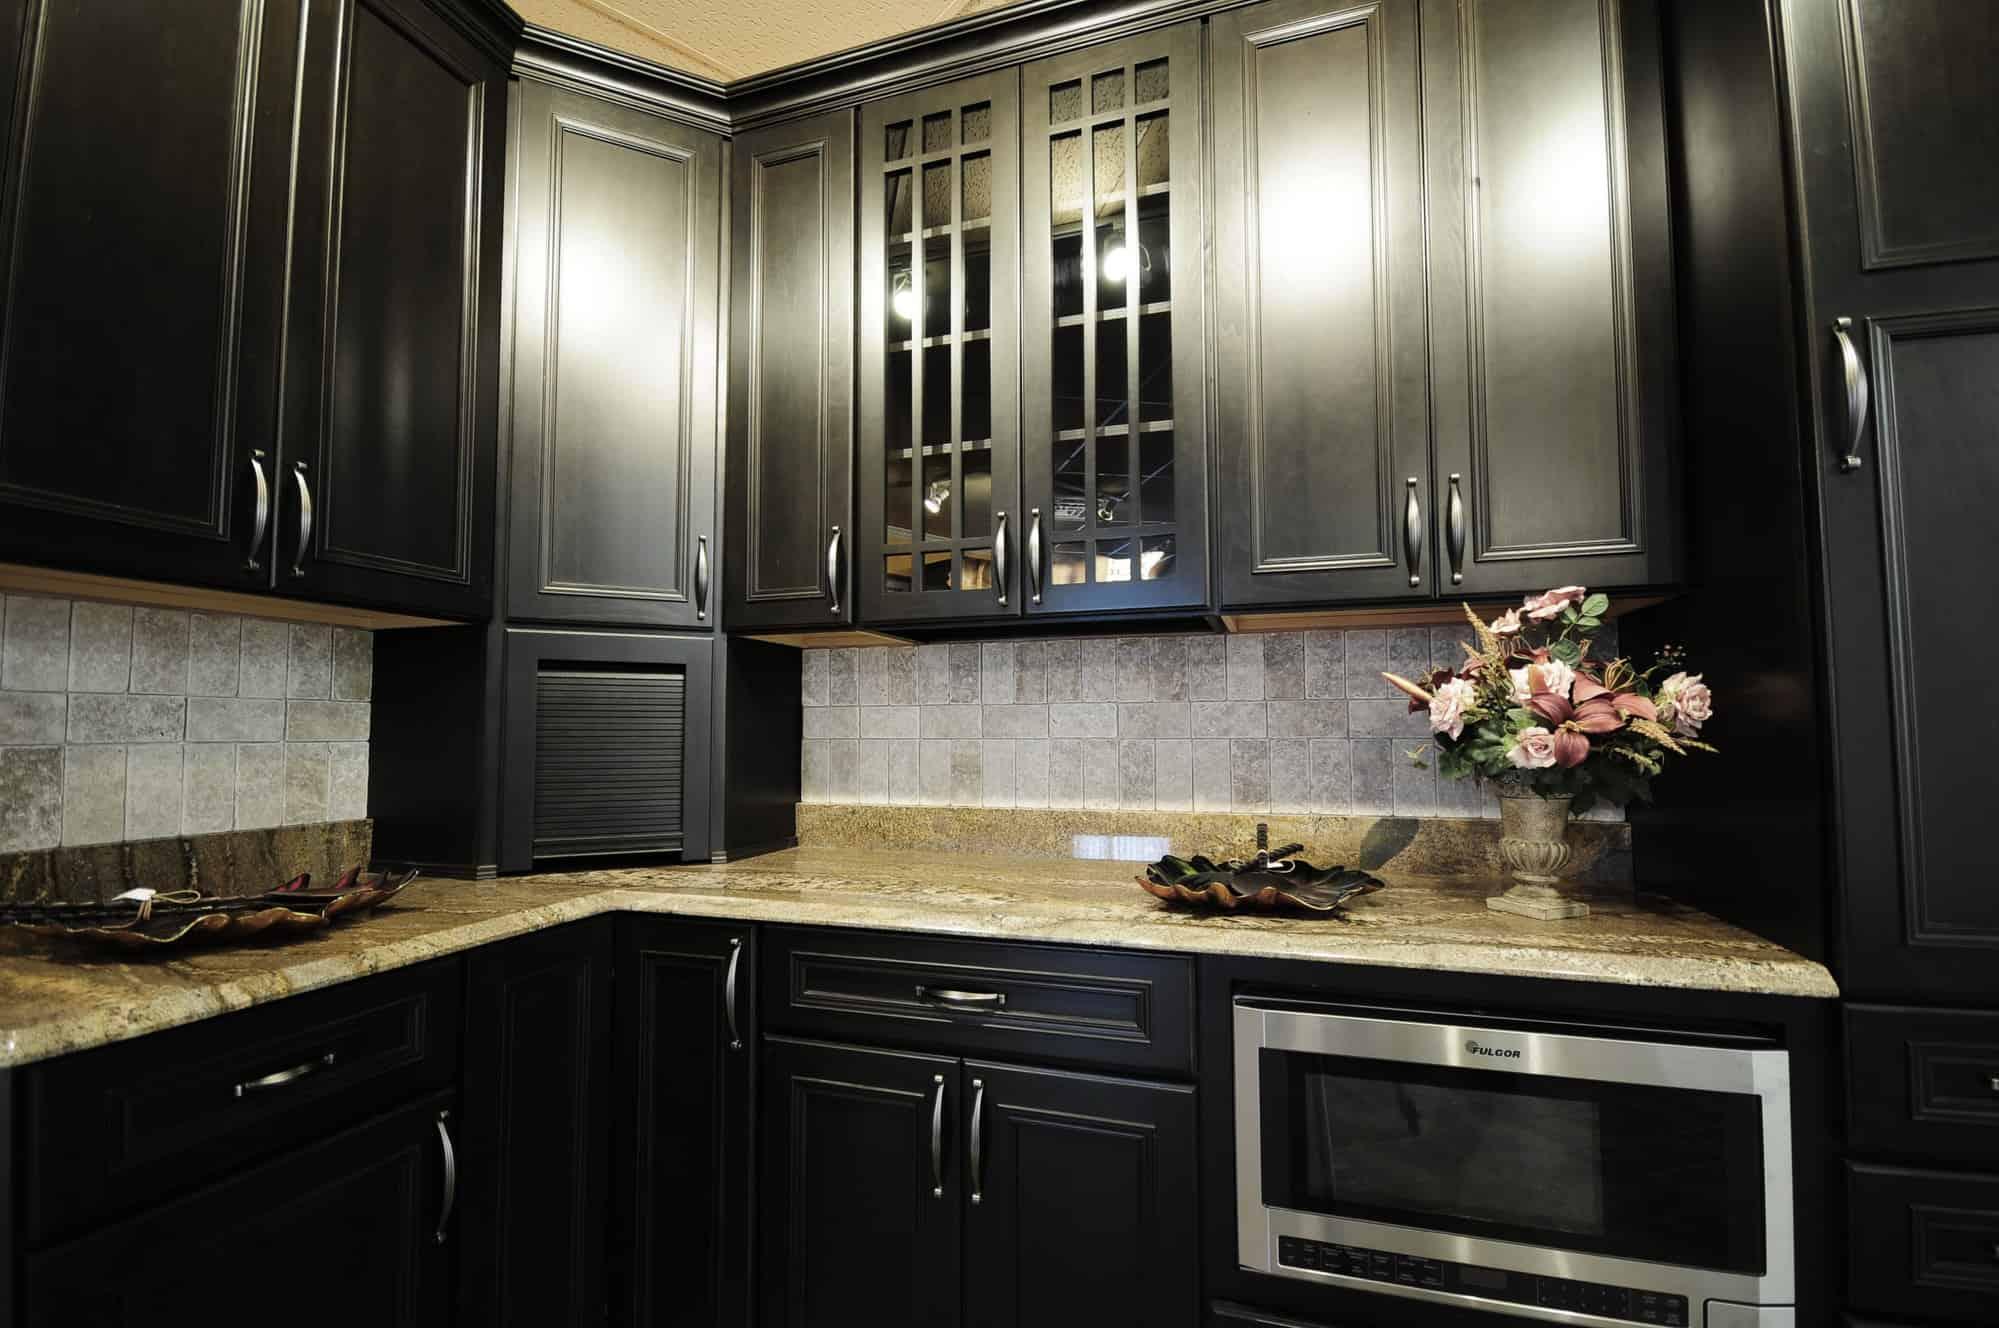 Modern Kitchens Palm Desert. Kitchen Remodeling Palm Desert California